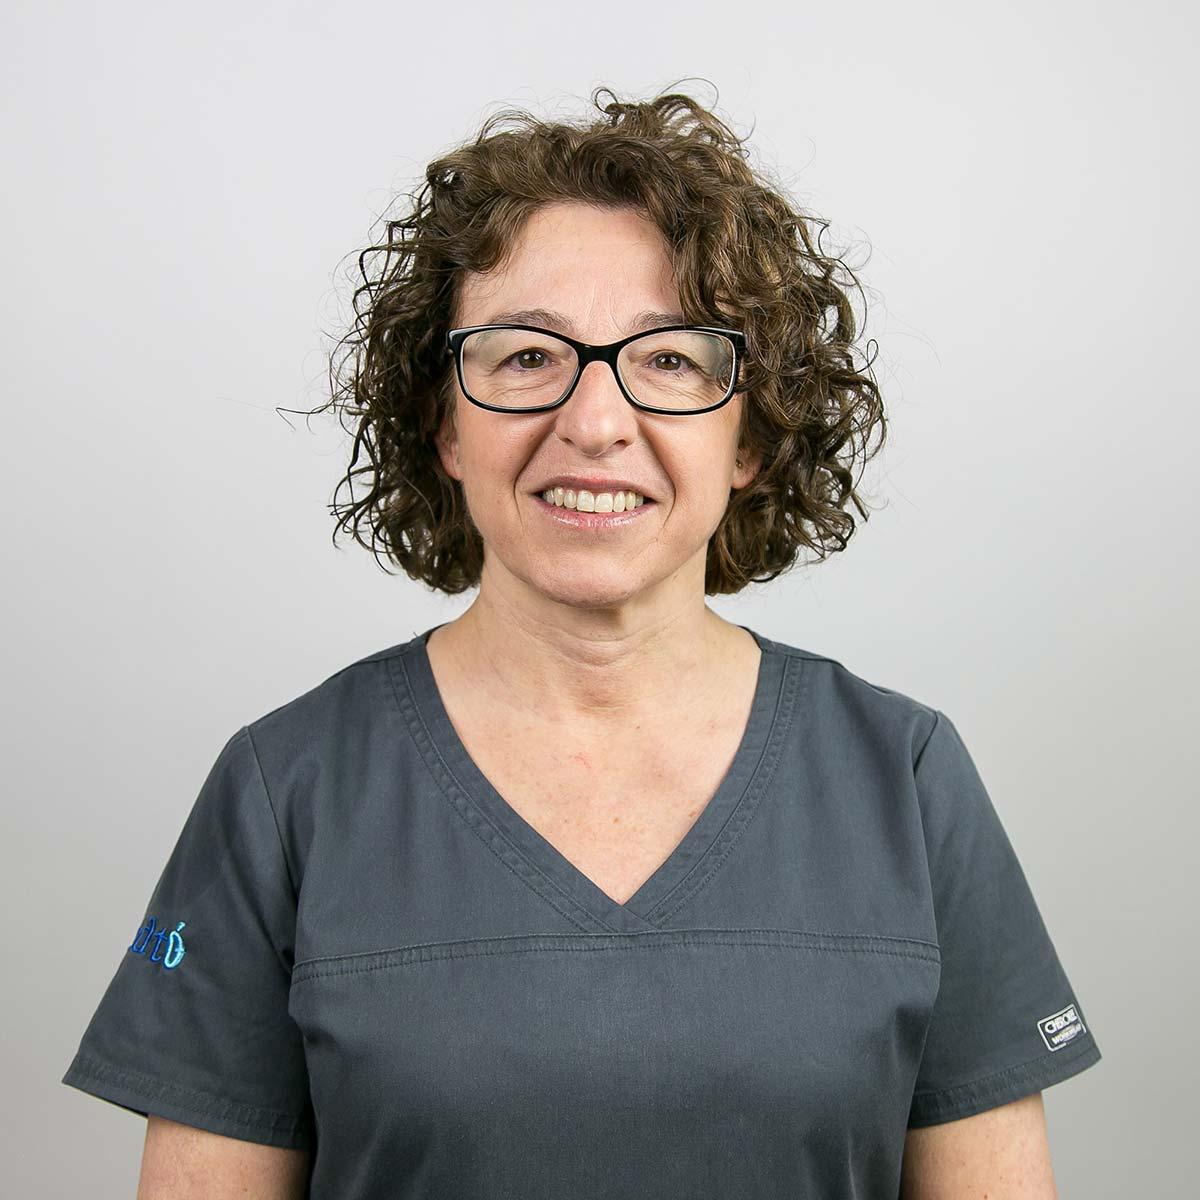 NURIA ESPINA - Periodoncia - Higiene dental